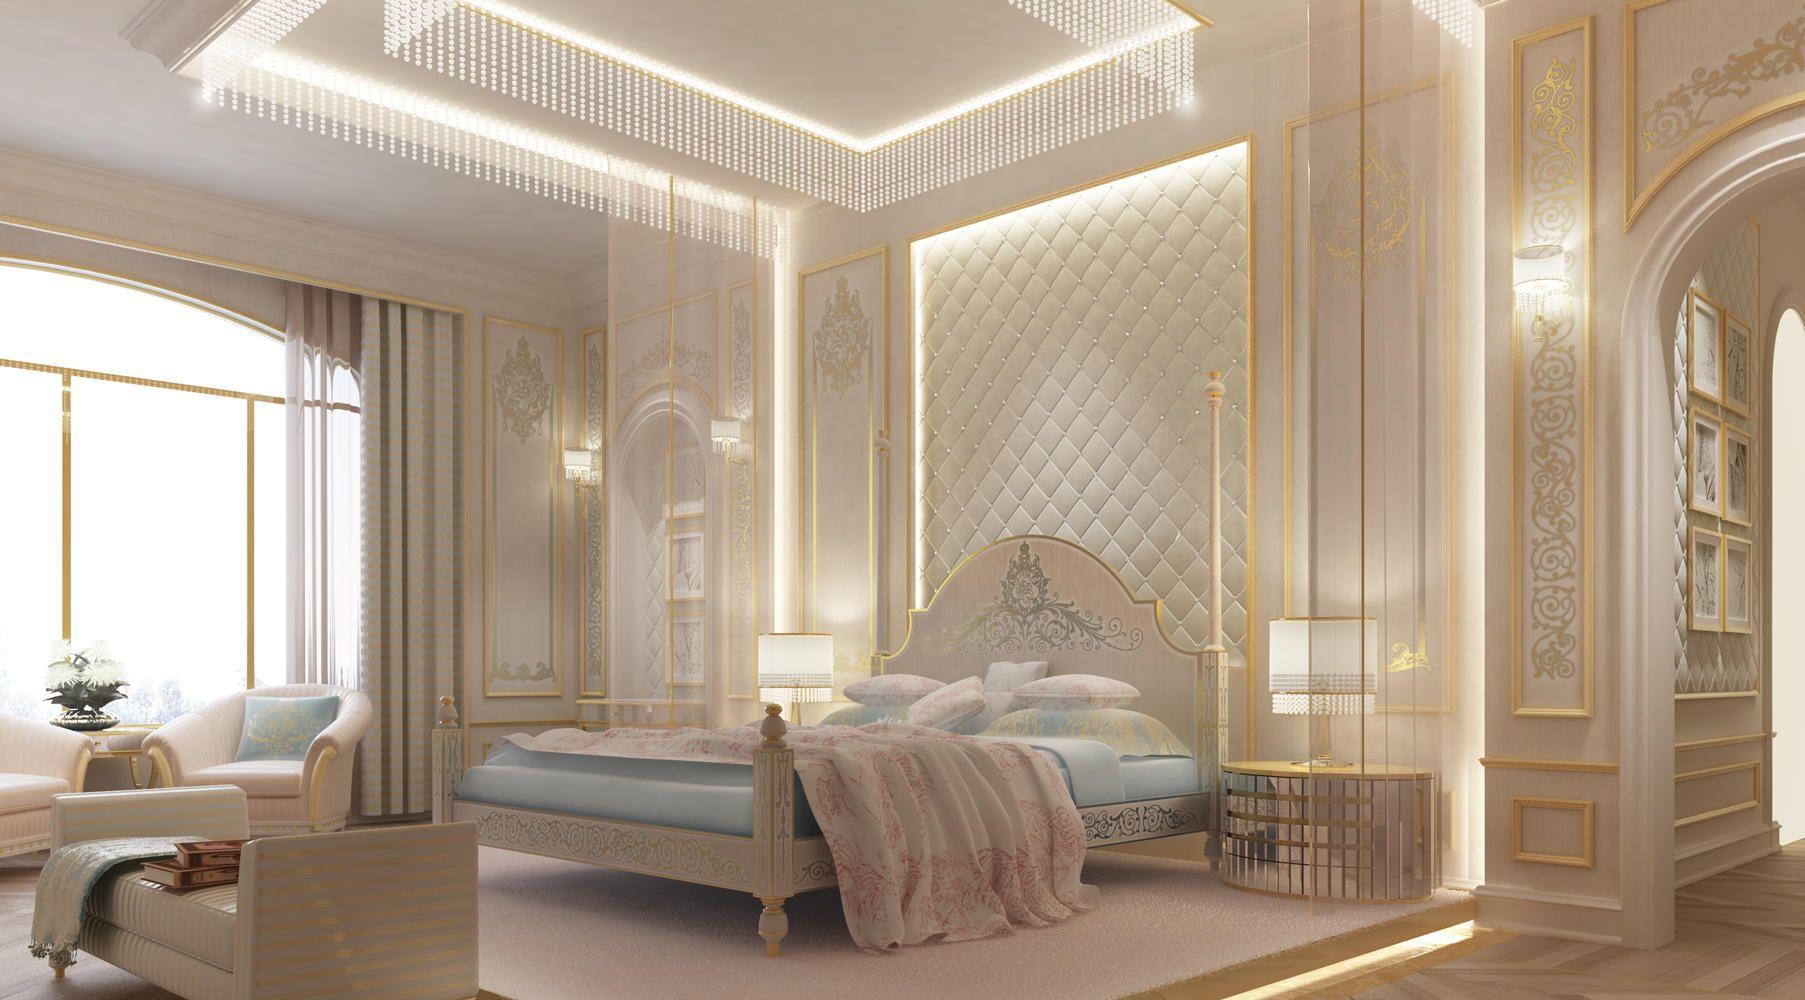 Best Dubai Bedroom Bedroom Design Abu Dhabi Palace Jpg 640 x 480